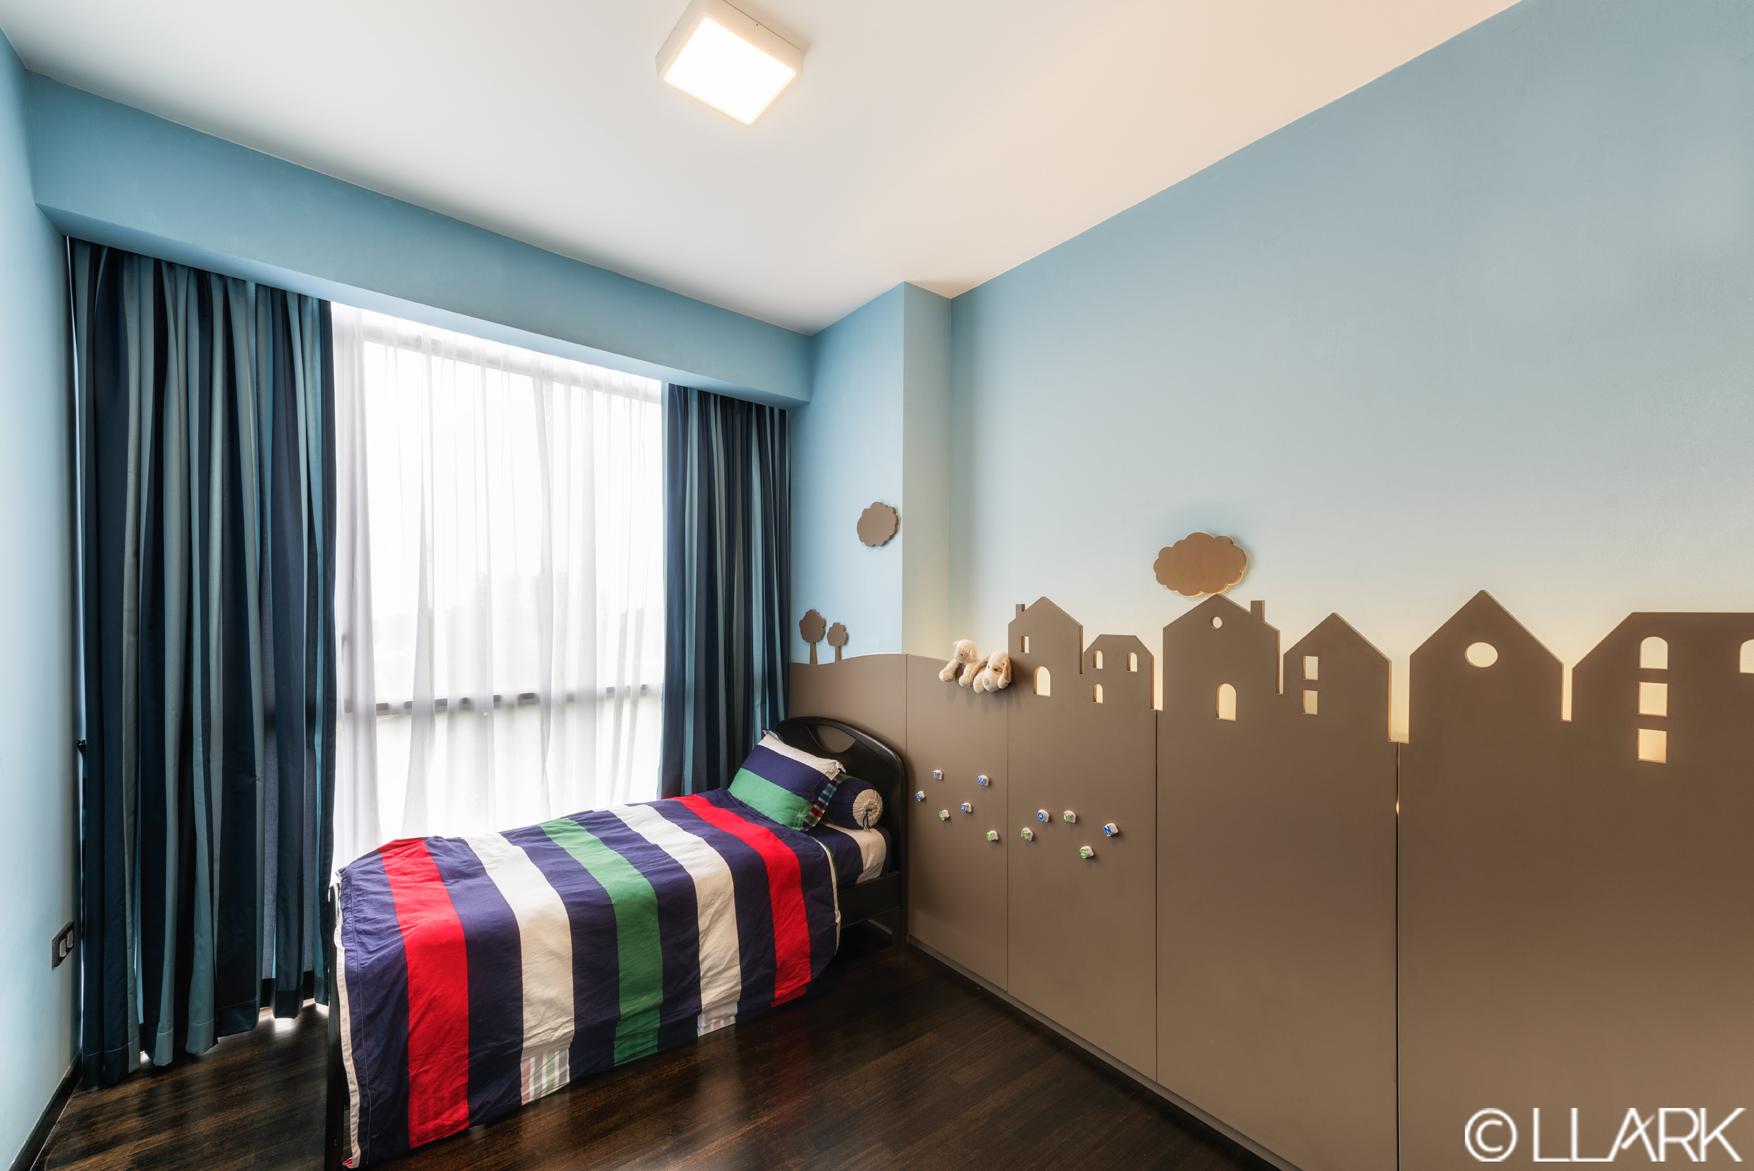 LLARK_AALTO_Kid's Room_R.jpg